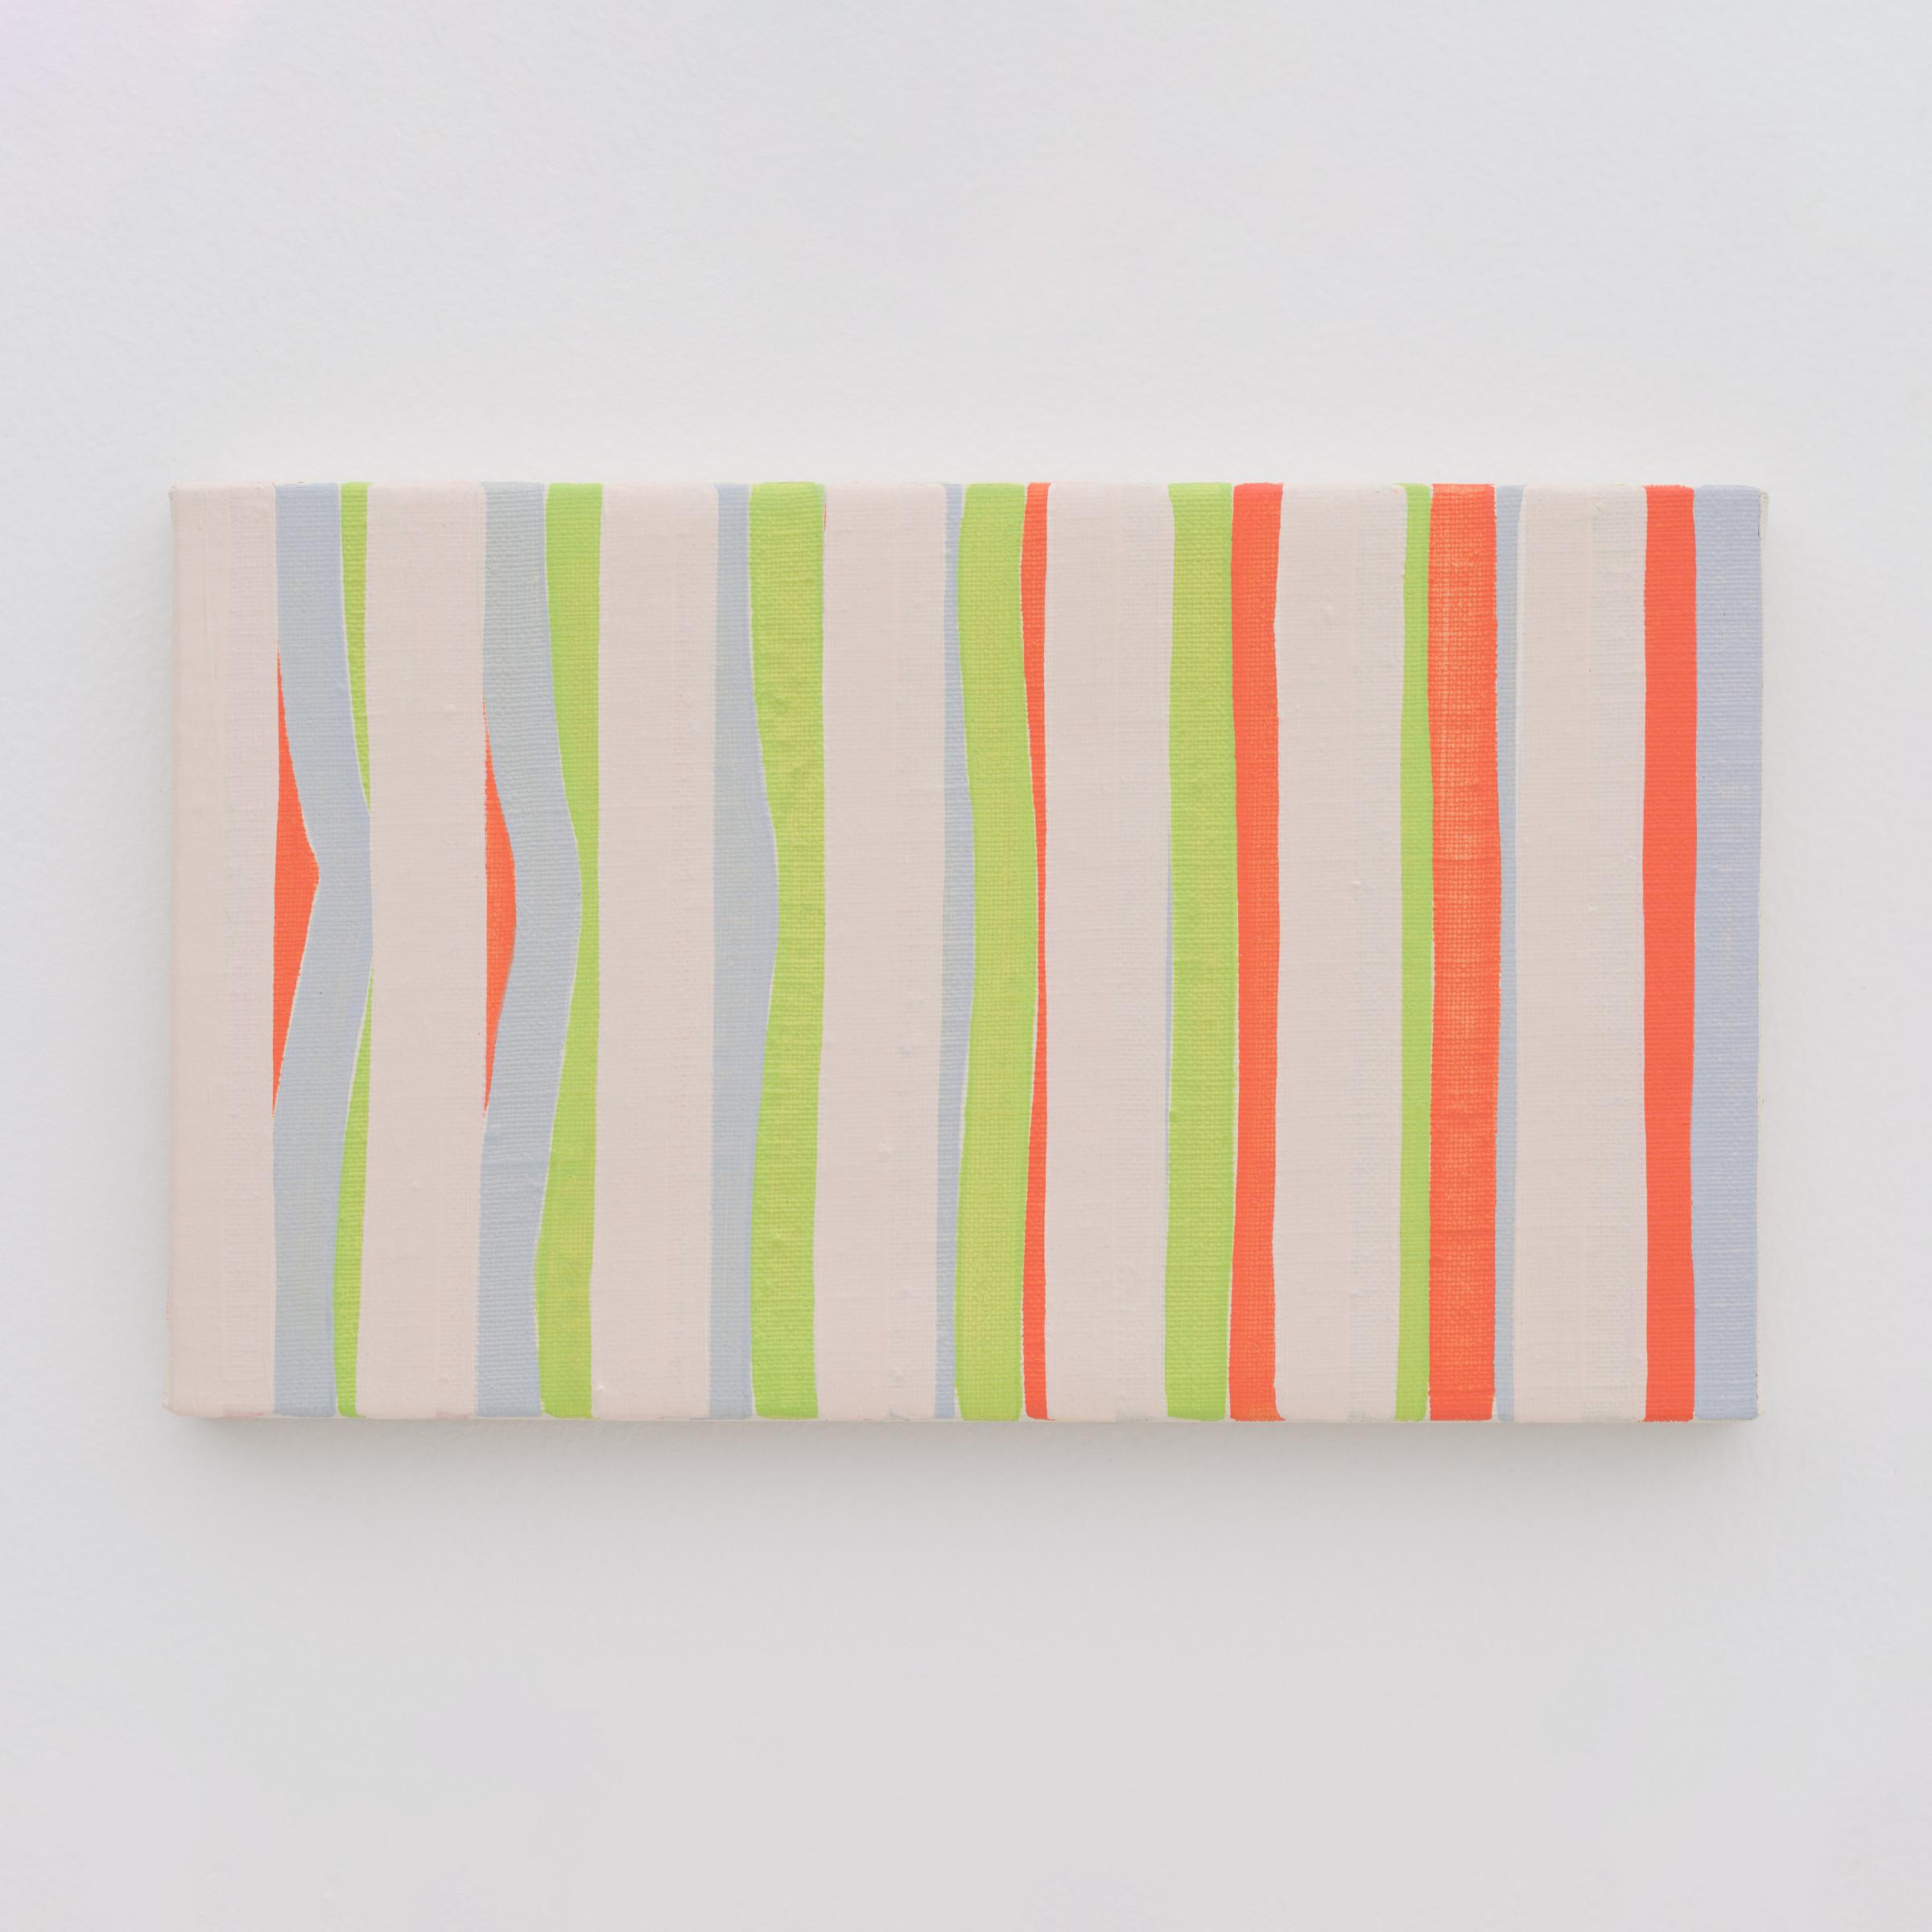 "<span class=""link fancybox-details-link""><a href=""/exhibitions/172/works/artworks16578/"">View Detail Page</a></span><div class=""artist""><strong>Yui Yaegashi</strong></div><div class=""title""><em><-<--></em>, 2019</div><div class=""medium"">oil on canvas</div><div class=""dimensions"">16,5 x 28 cm</div>"